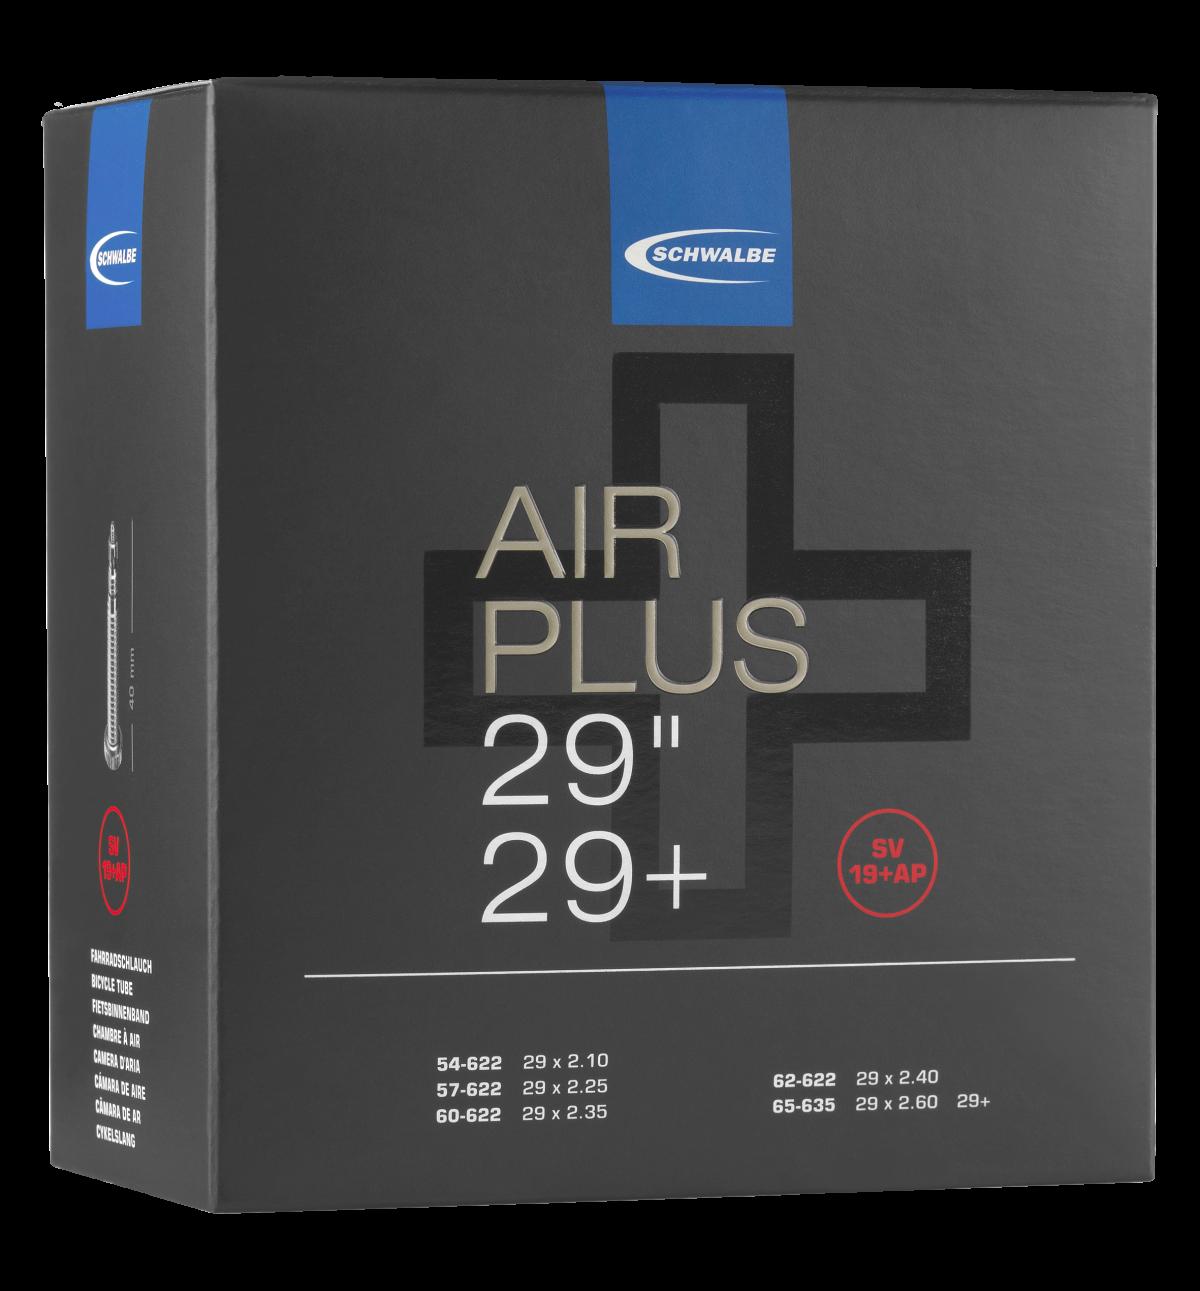 "Schwalbe Air Plus Schlauch 29""/29+ No. 19+AP (SV19+AP, AV19+AP)"